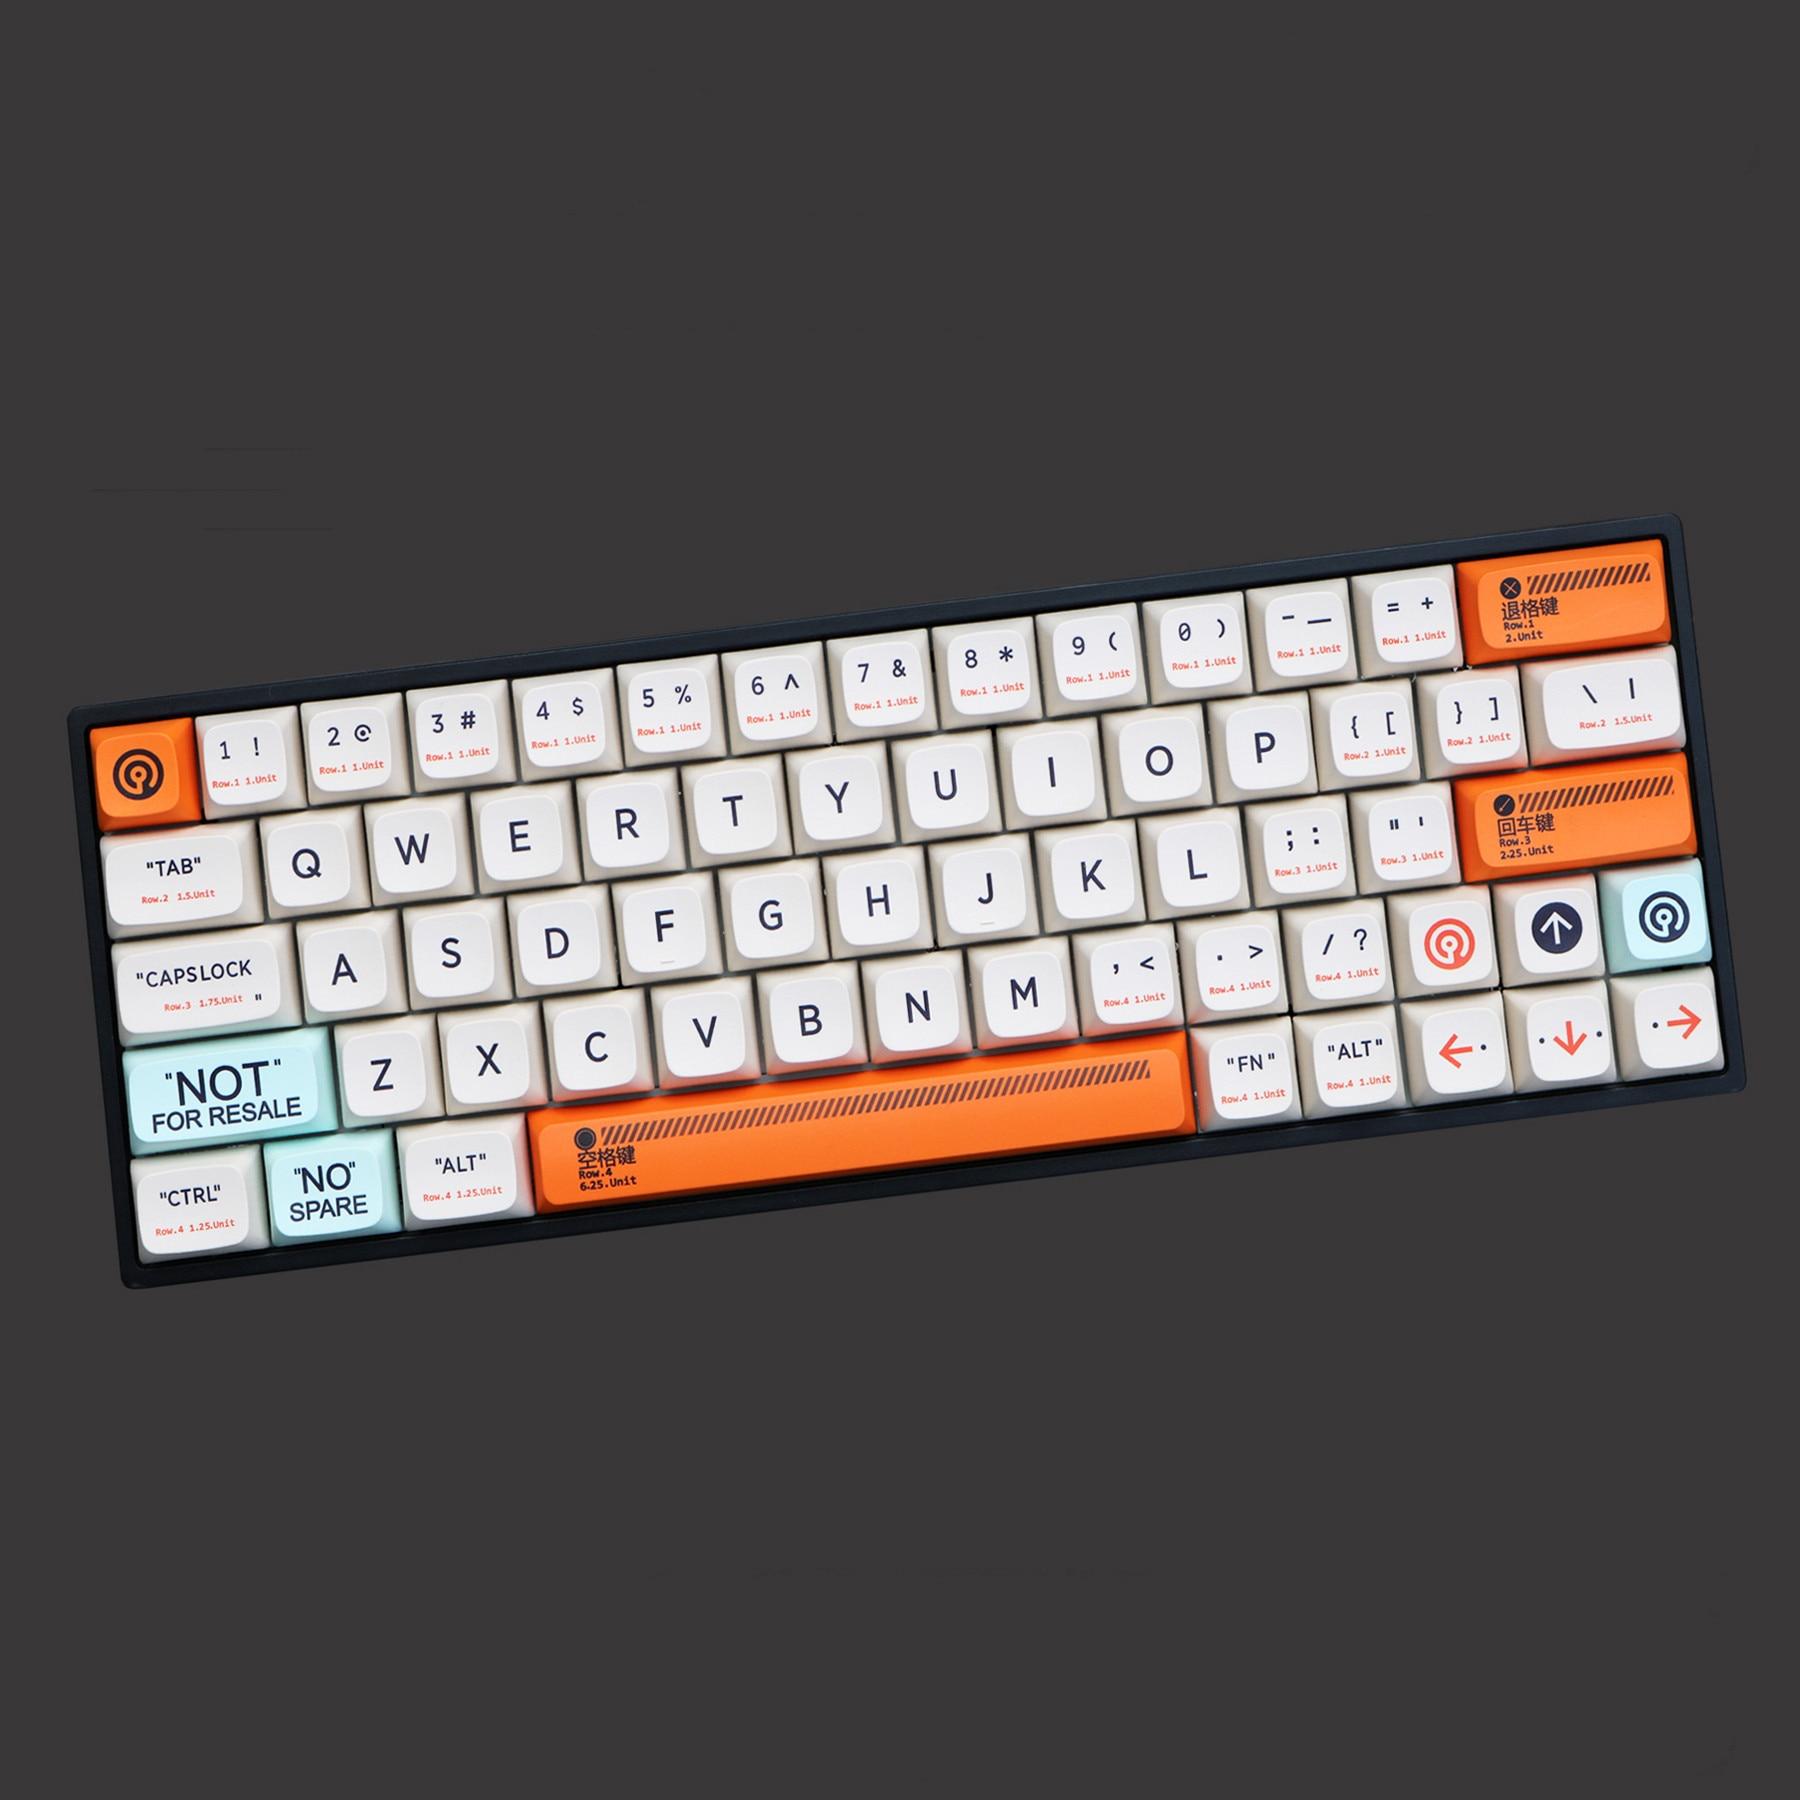 143 Keys/set Plastic Theme PBT Dye Subbed Key Caps For MX Switch Mechanical Keyboard XDA Profile Keycap For 68 84 96 980M